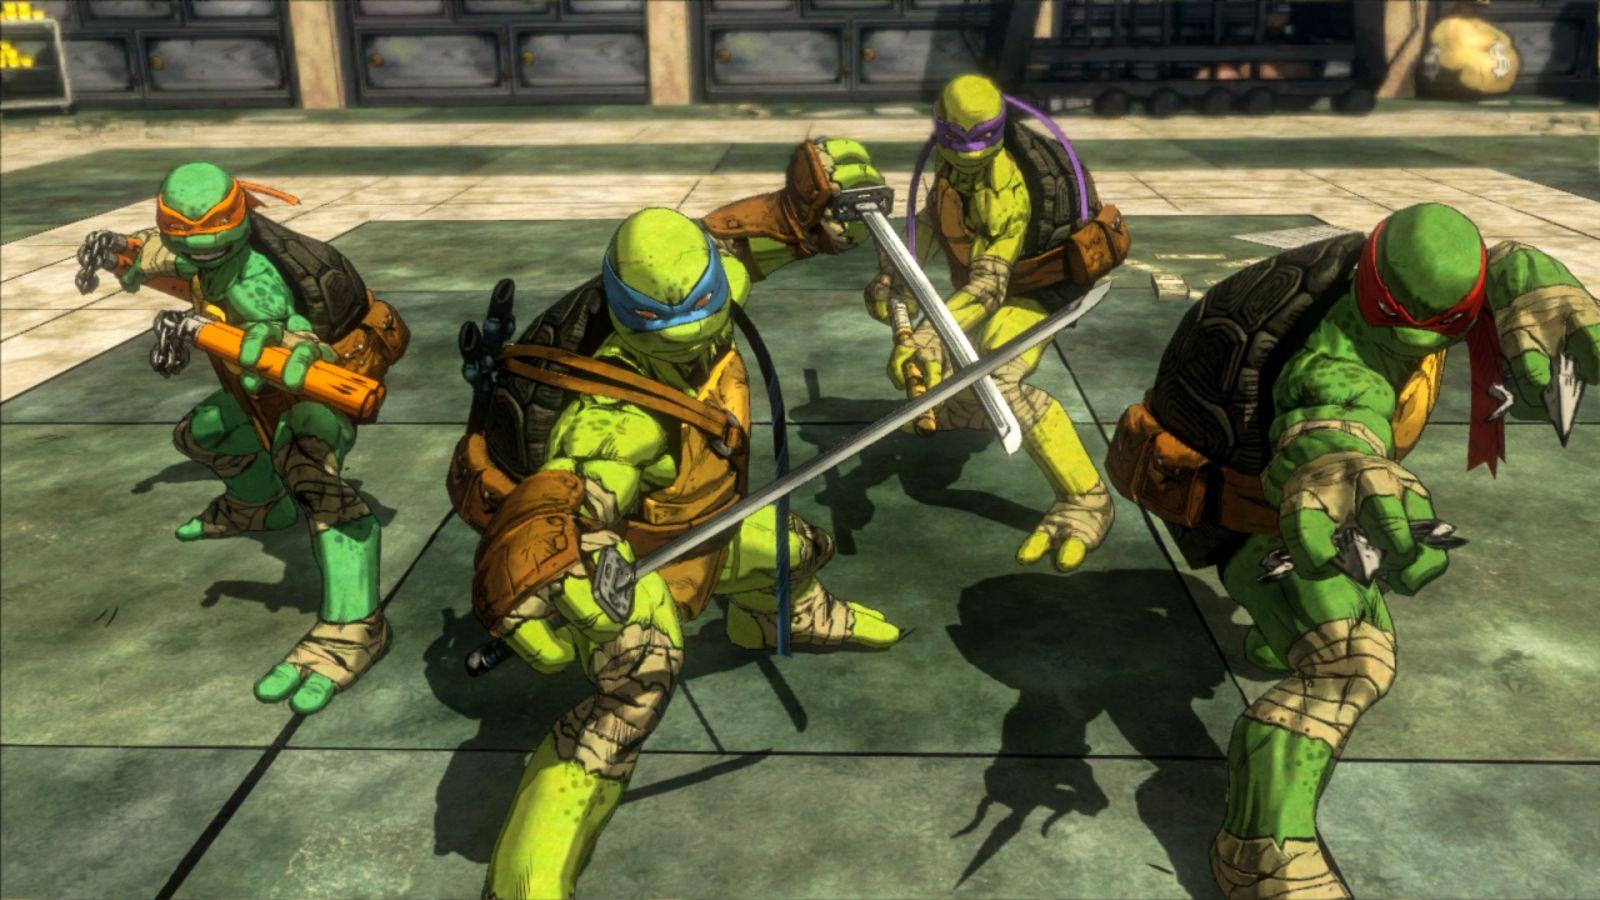 Bereits Anfang des Jahres nahm Activision einige Spiele aus dem Teenage Mutant Ninja Turtles Universum aus dem Steam-Sortiment. (Quelle: GameZone)